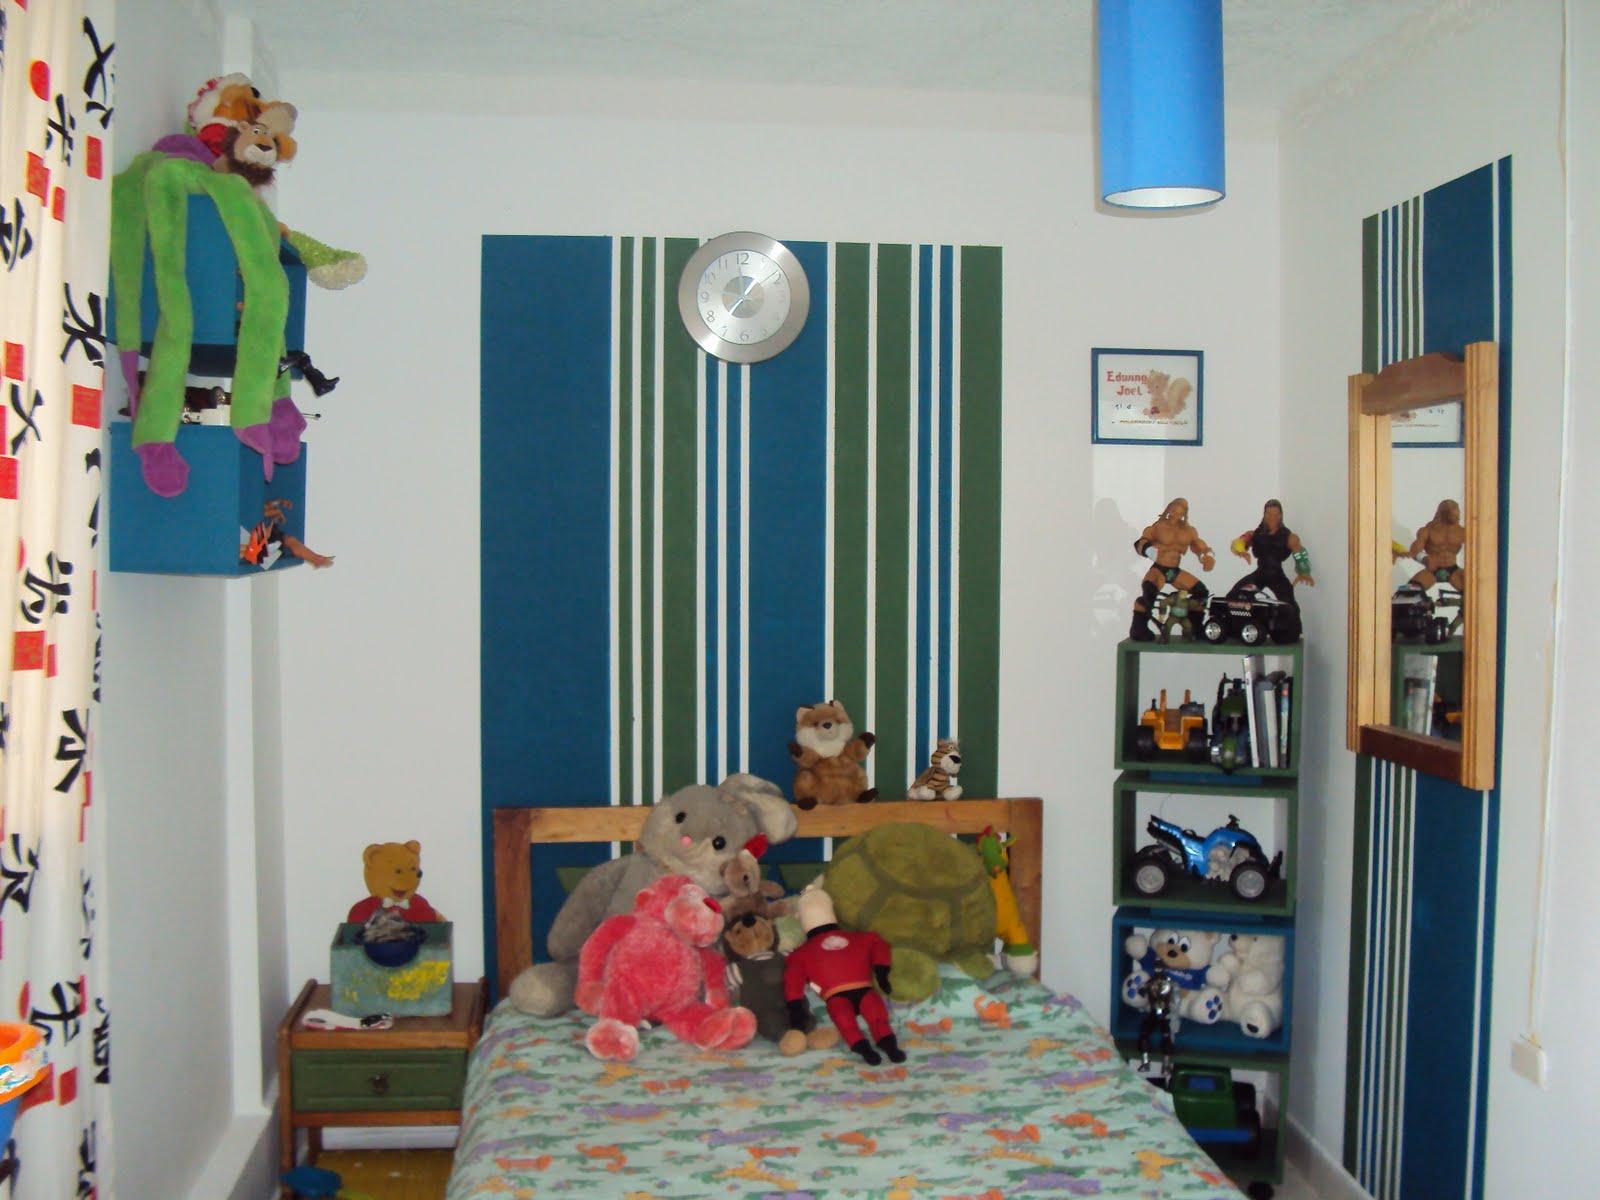 Gustarte decoracion decoracion deco hogar for Decoracion hogar santiago